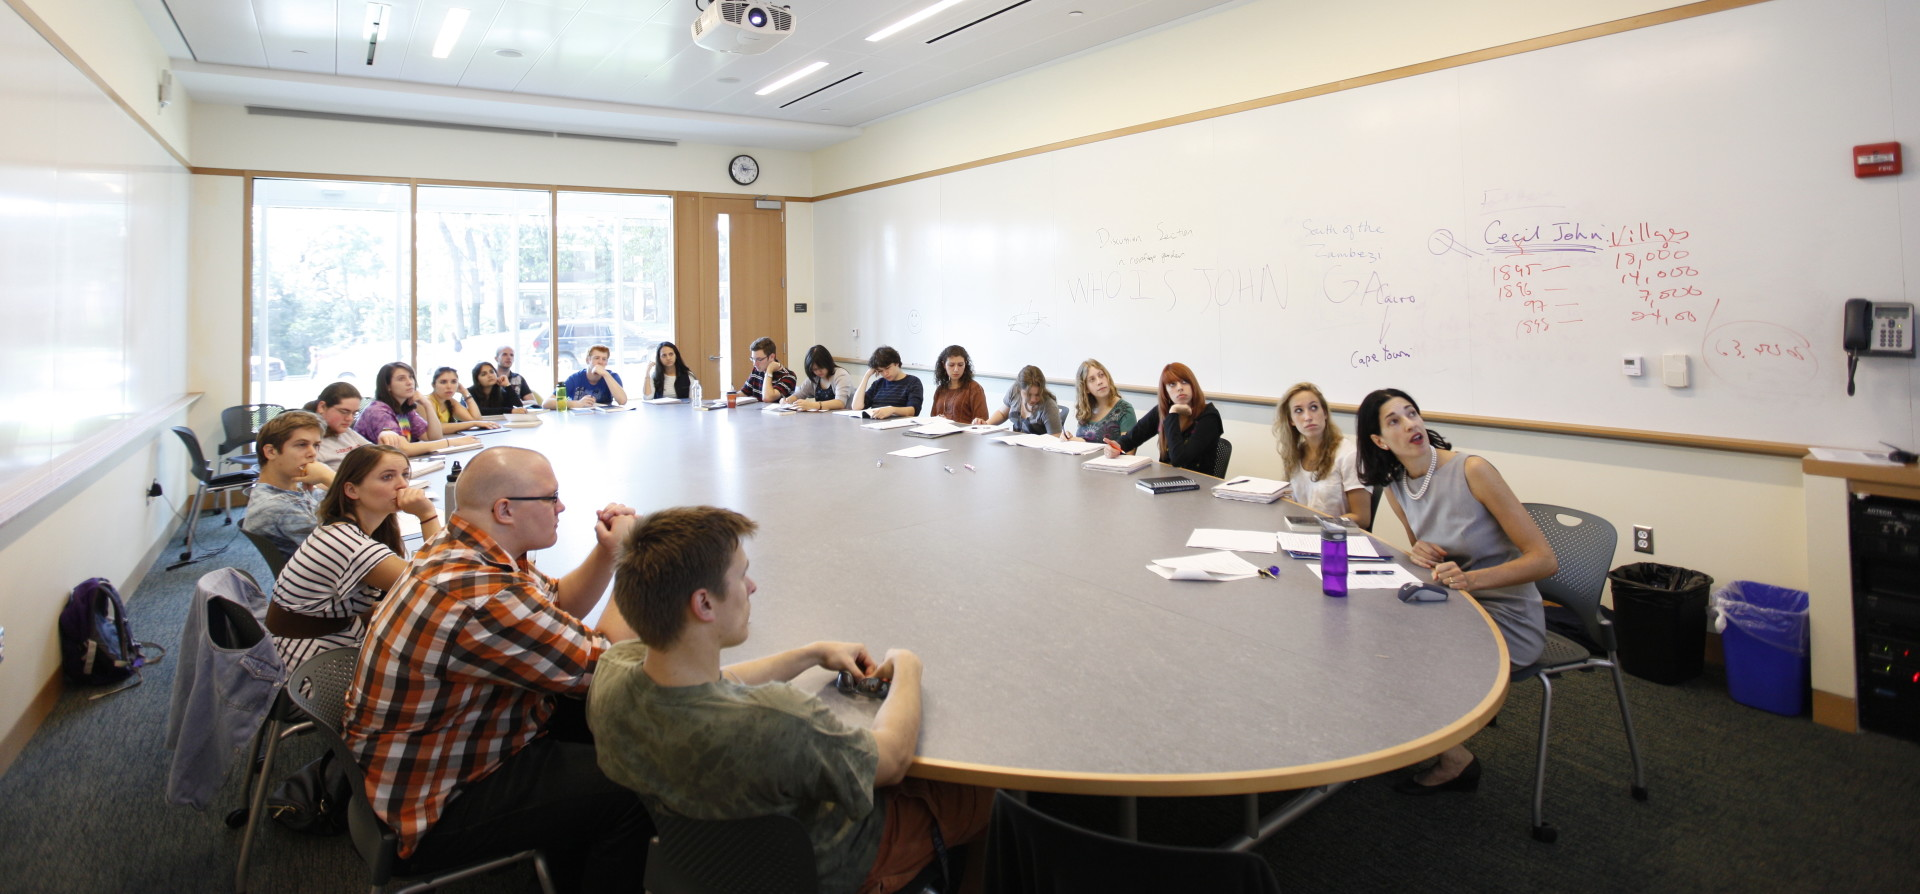 2014-10-26-Brandeis University-Photo 1 Cropped 2